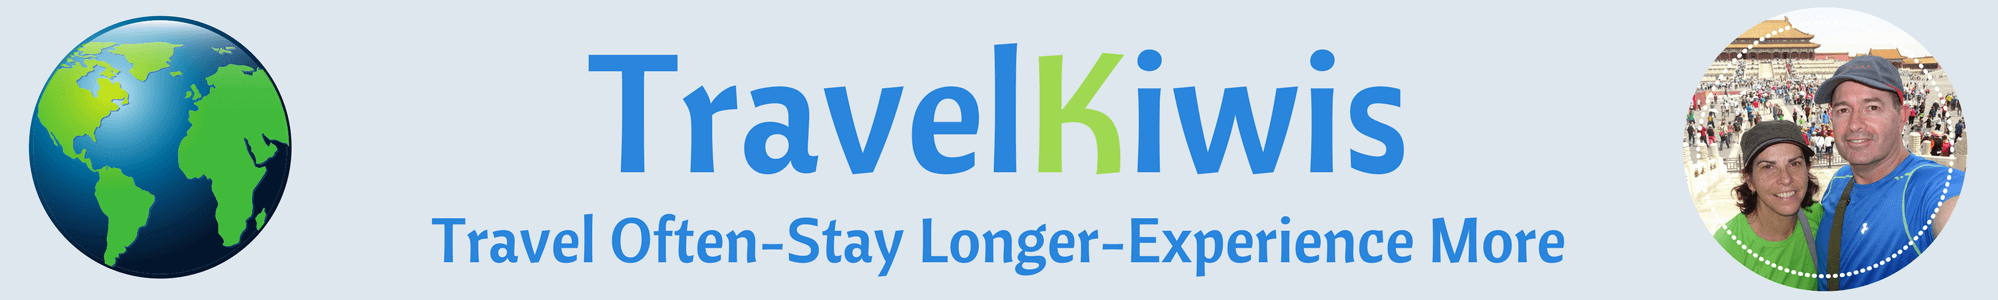 TravelKiwis